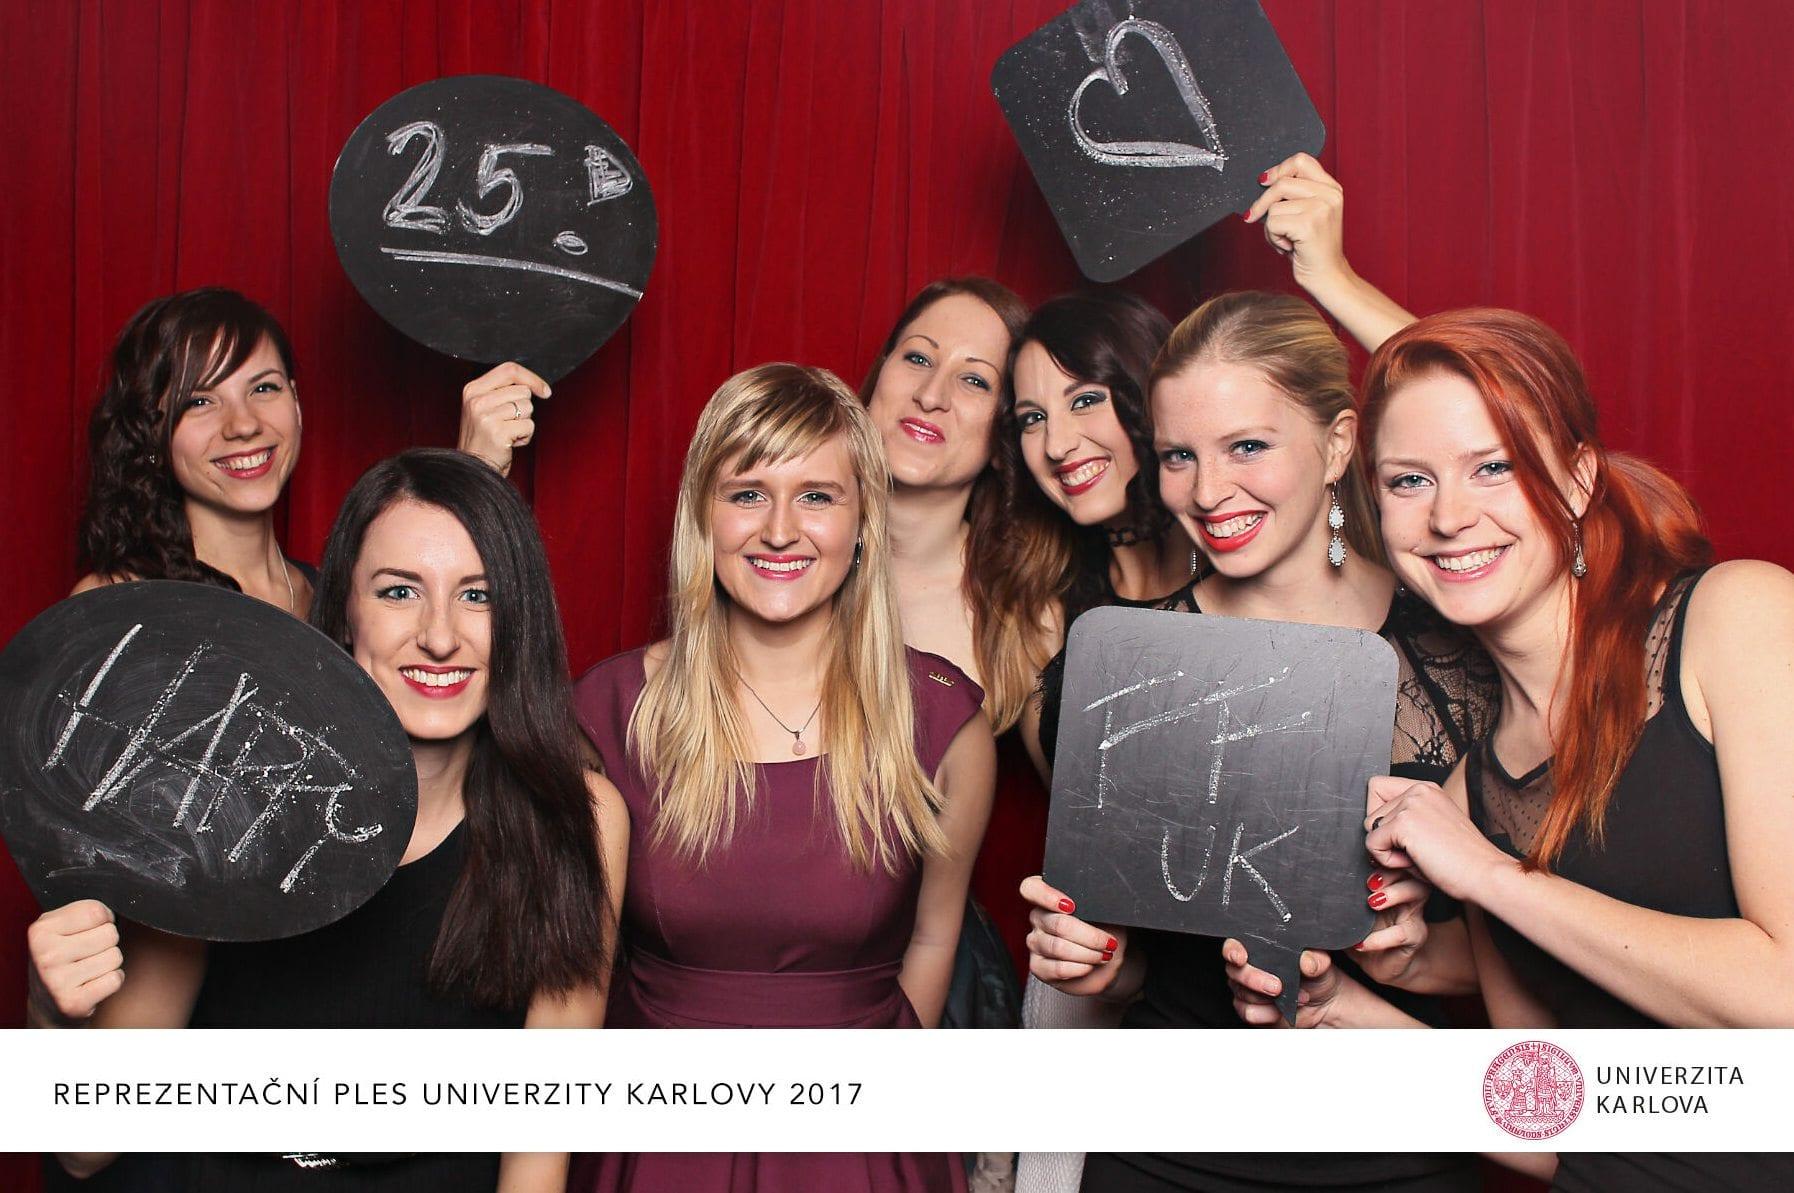 fotokoutek-reprezentacni-ples-univerzity-karlovy-2017-13-1-2017-202518